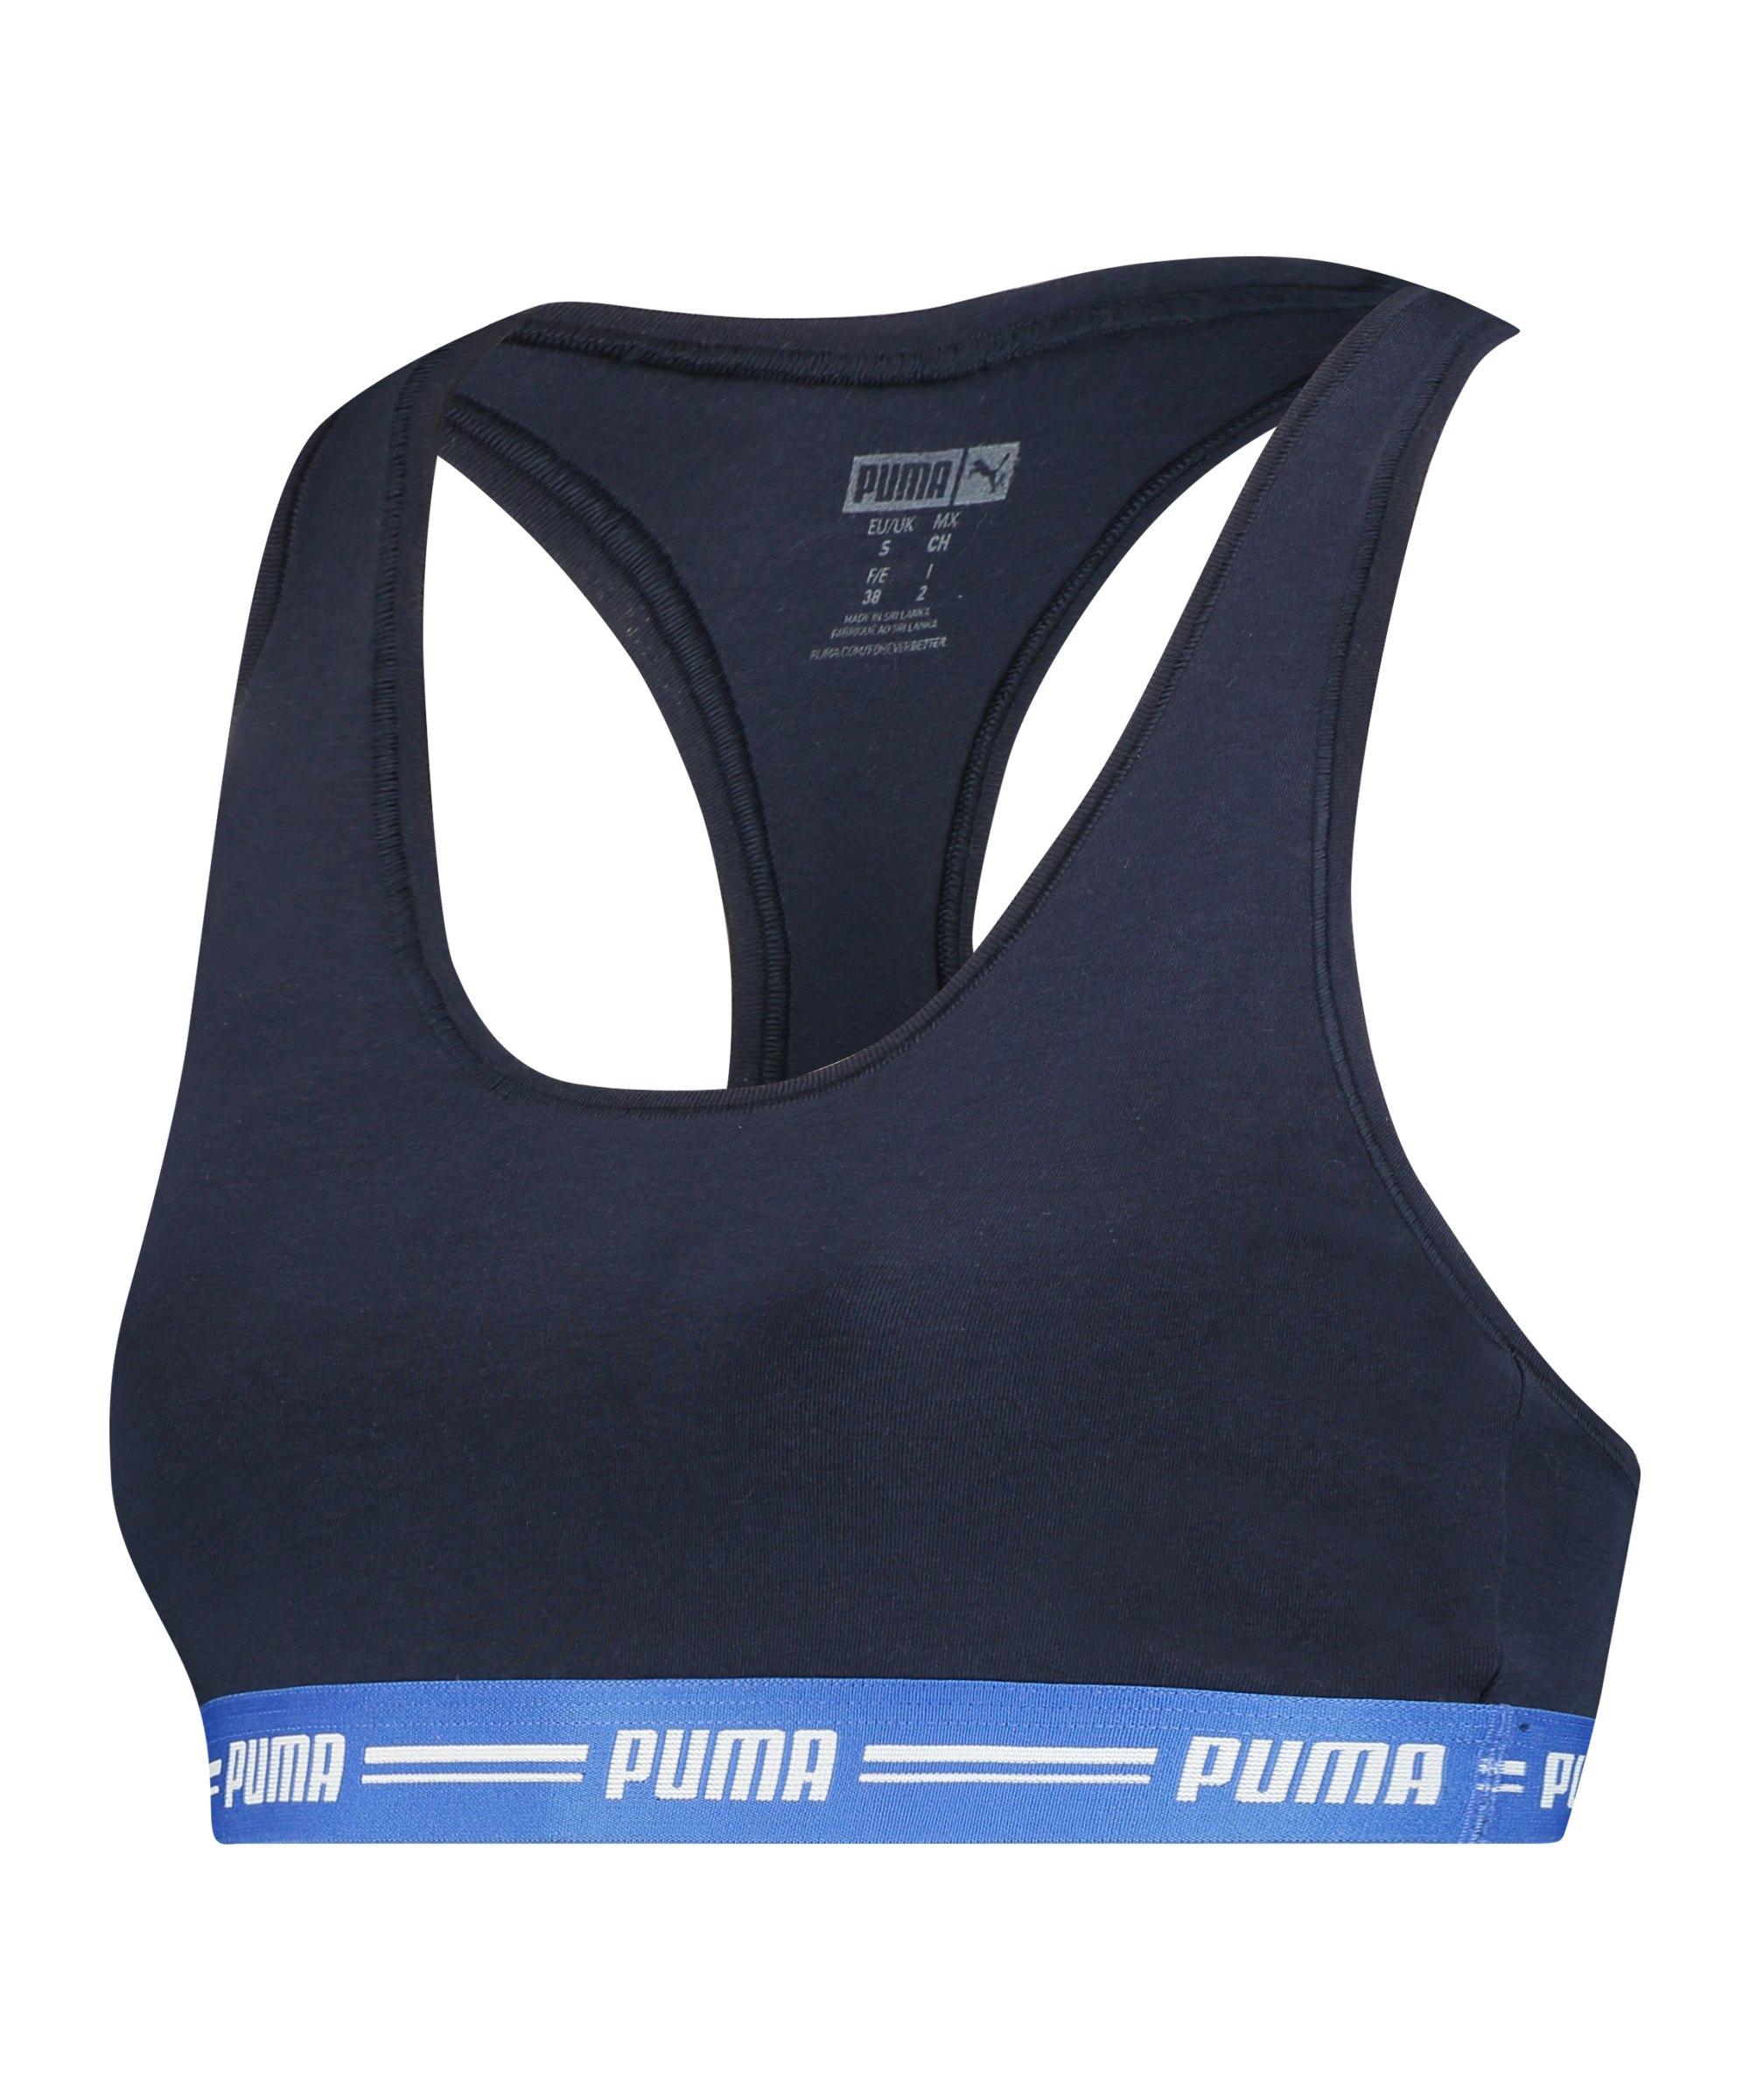 PUMA Racer Back Top Sport-BH Damen Blau F009 - blau